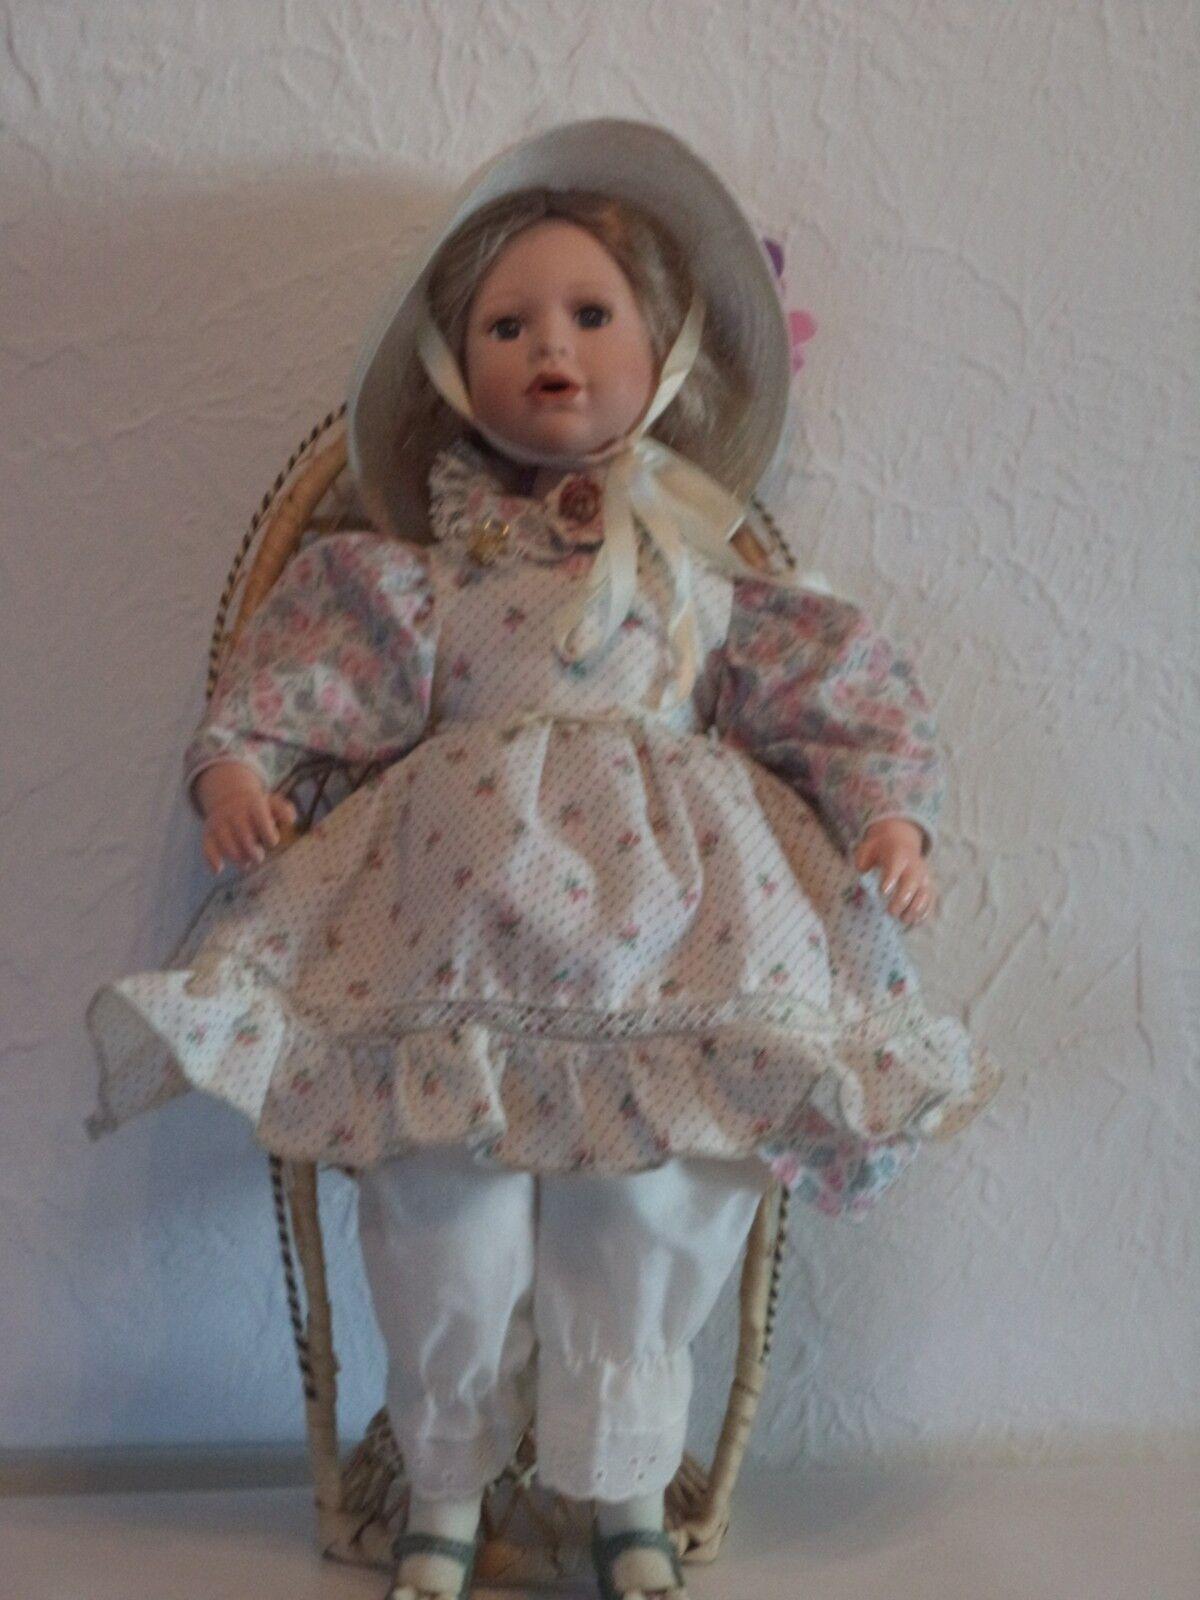 Vintage Julie Good-Kruger  Signed Porcelain bambola AuomoDA  ordina ora goditi un grande sconto